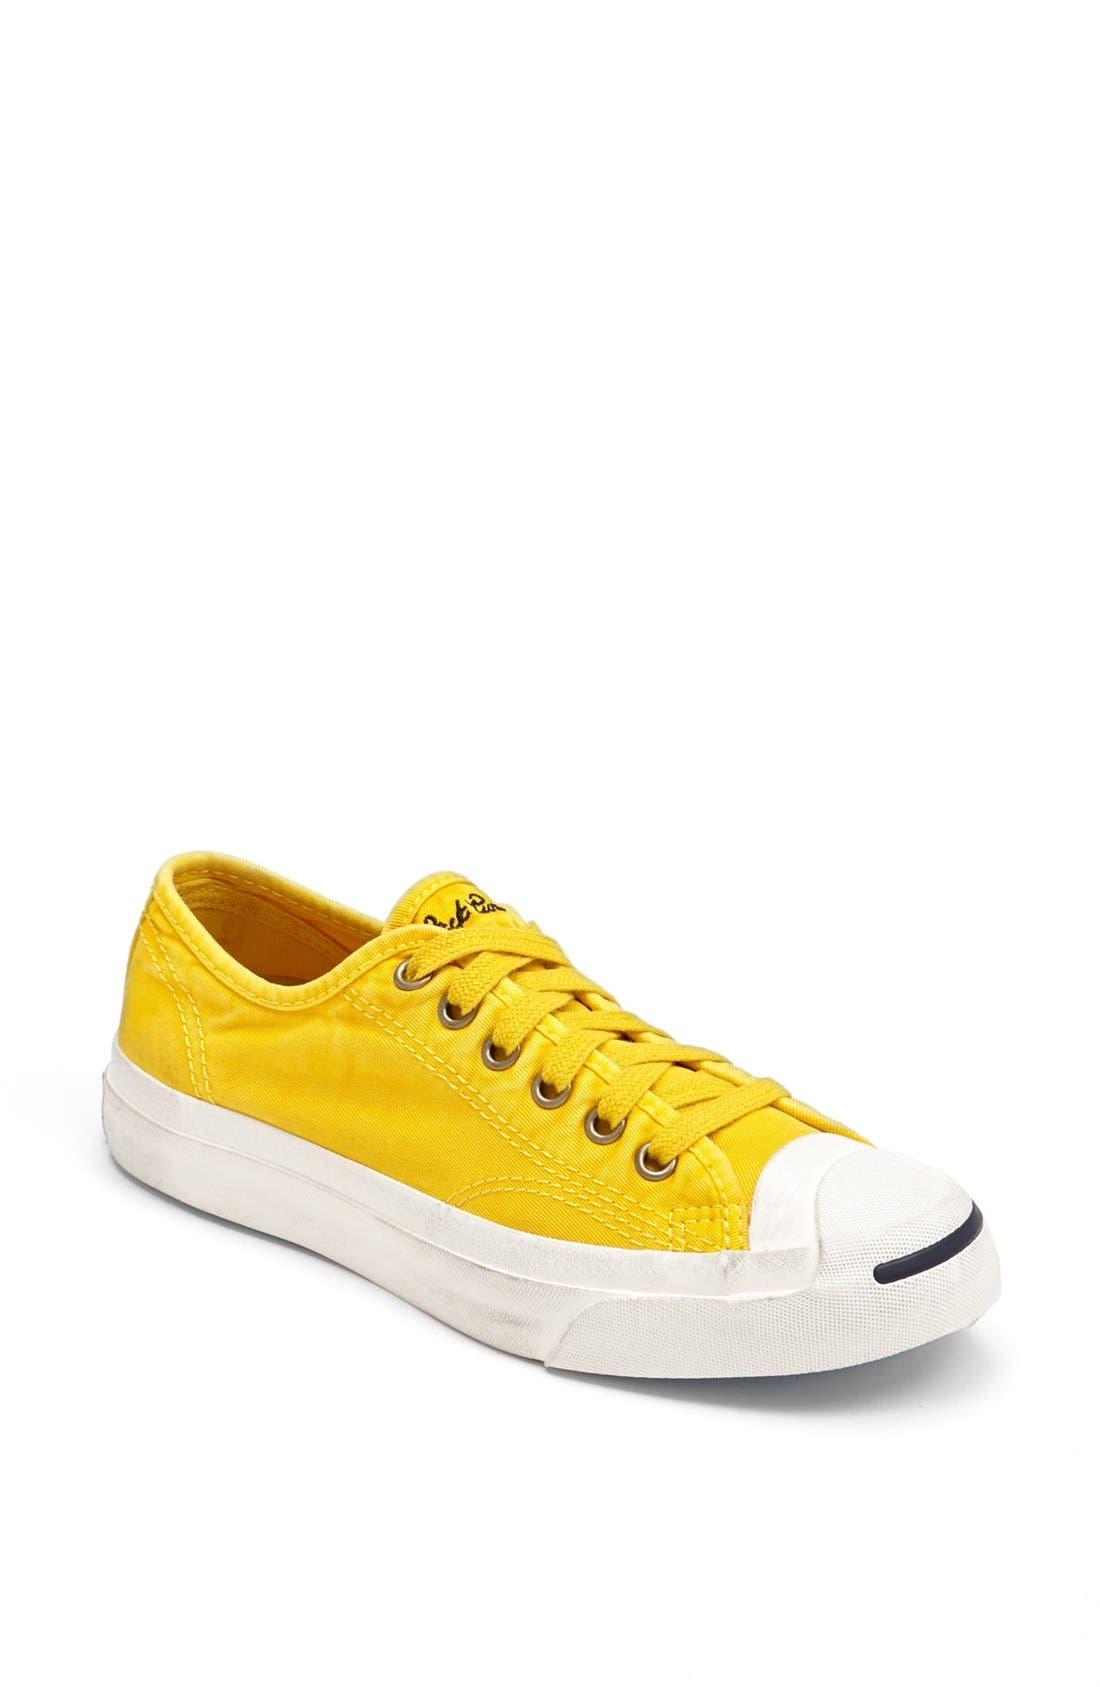 Main Image - Converse 'Jack Purcell' Sneaker (Women)